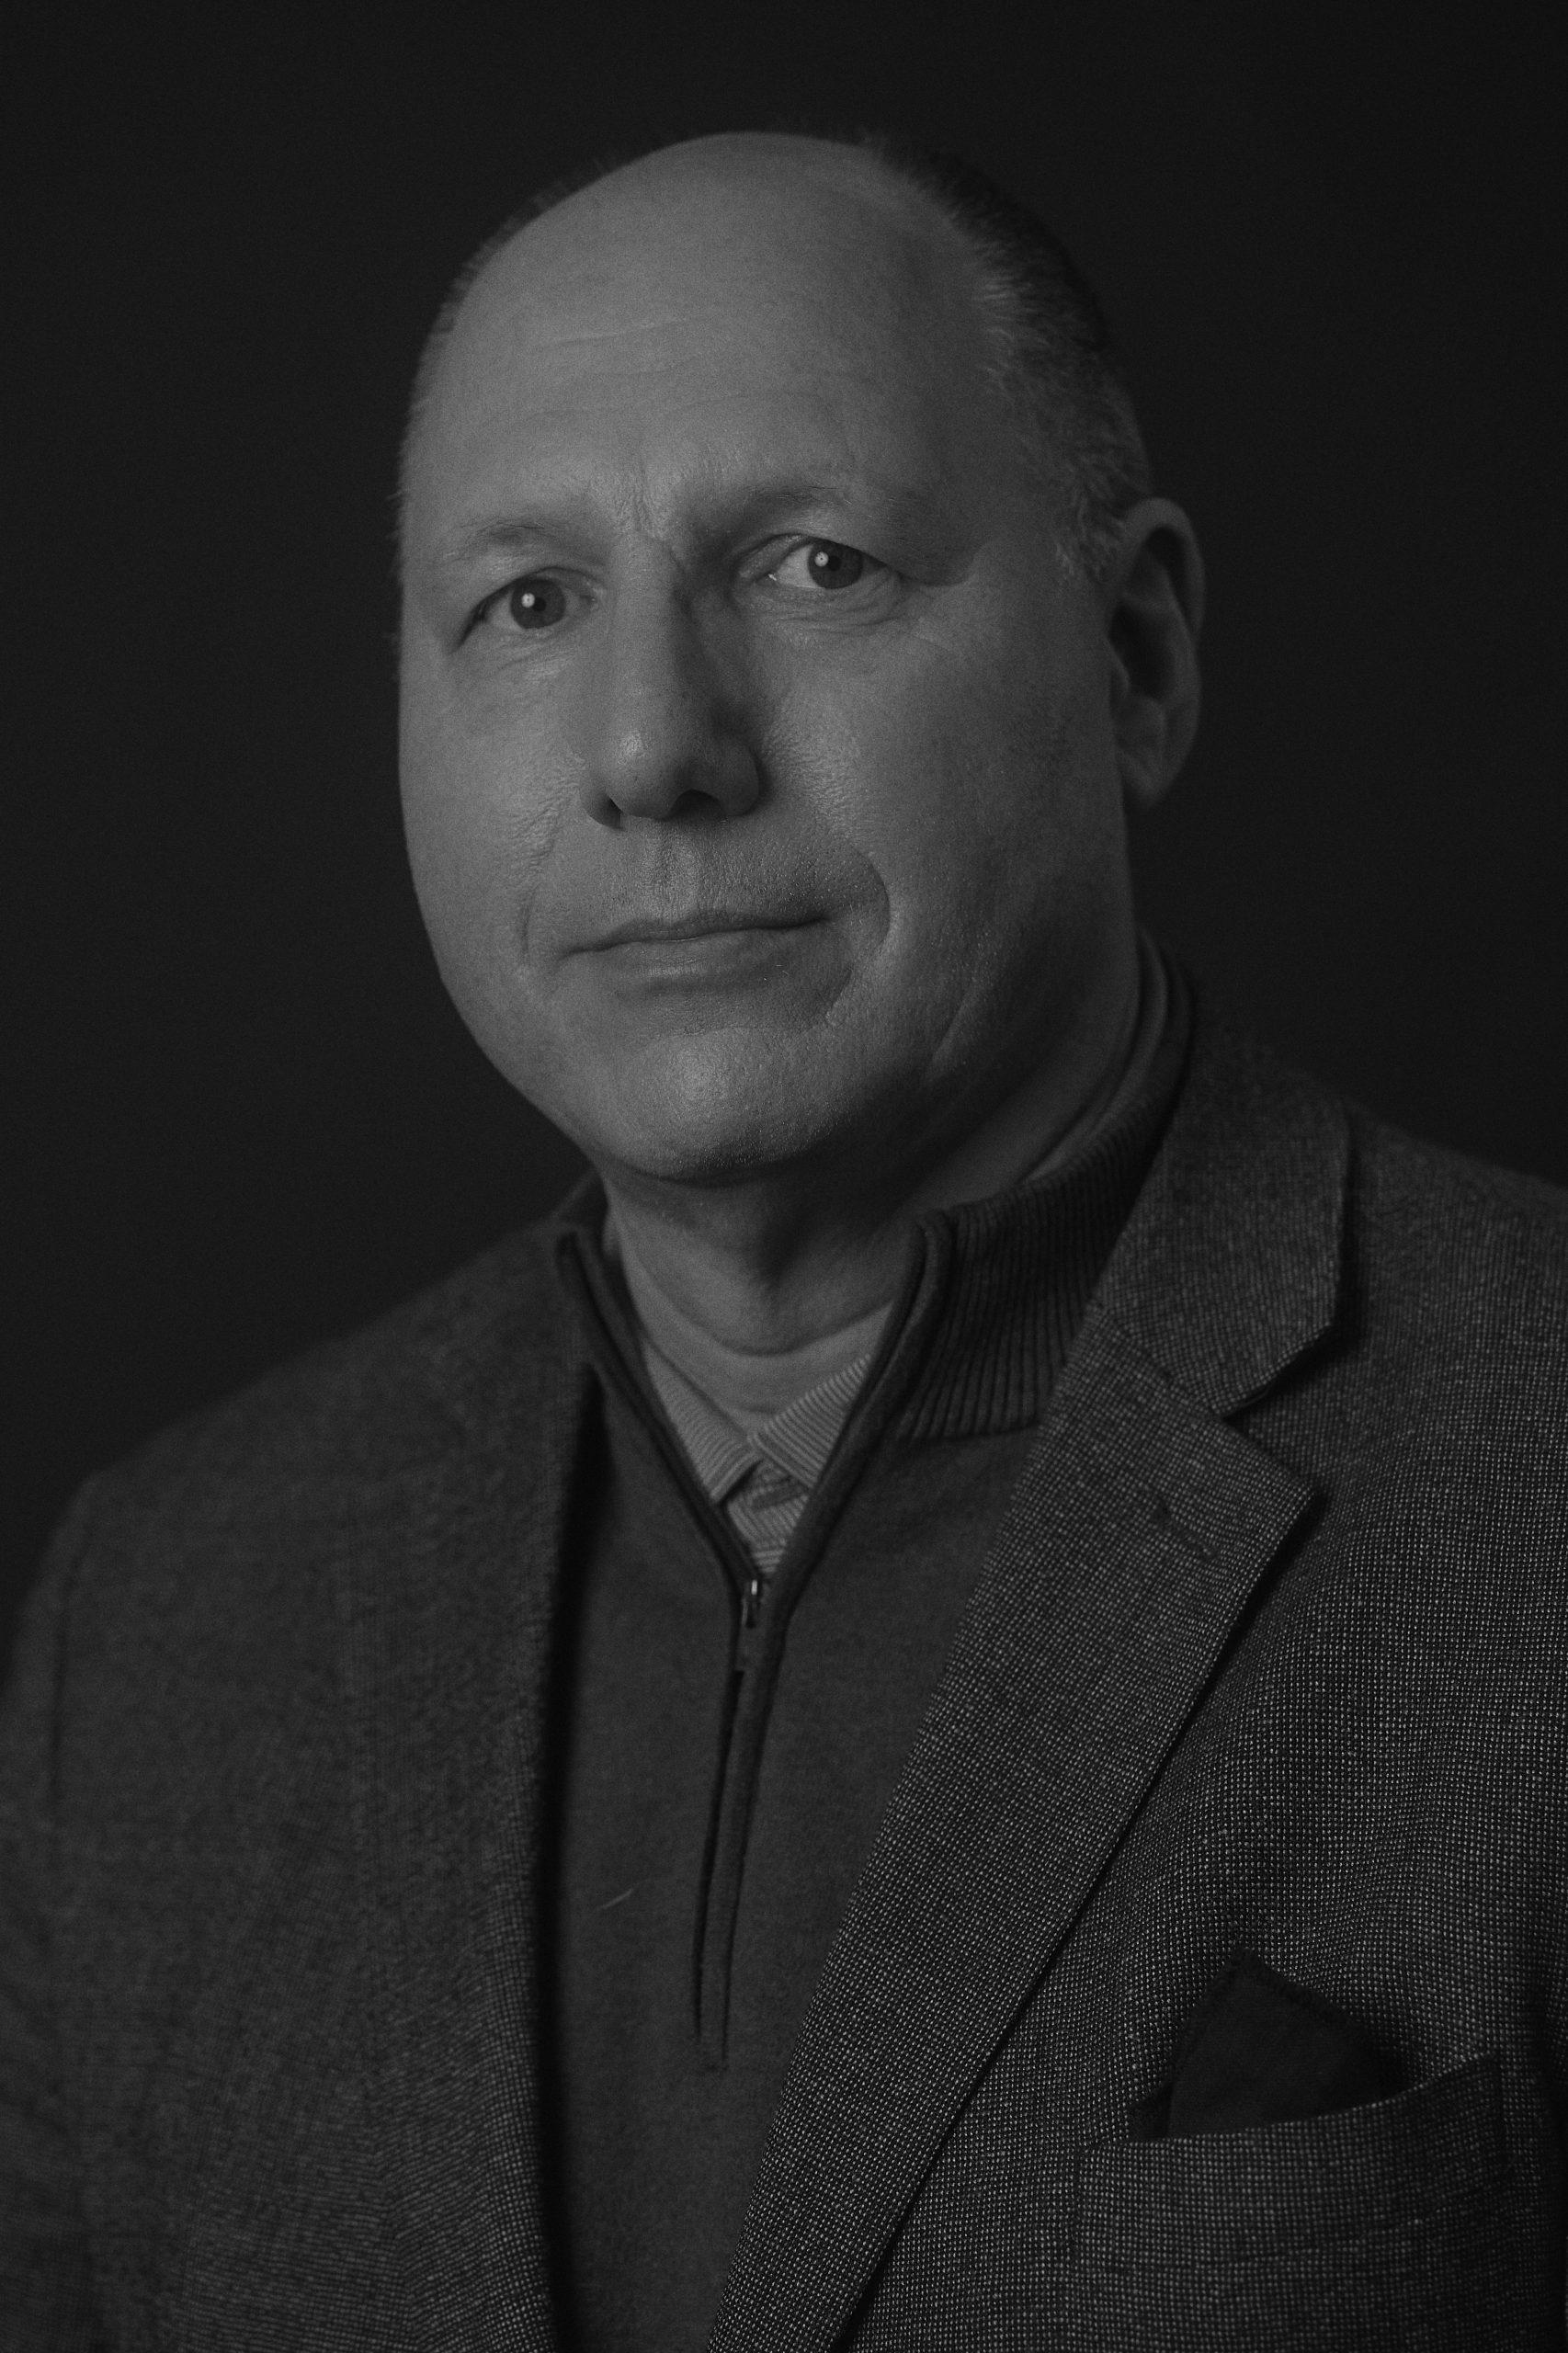 Mark Schwartz has been appointed CFO of Markforged. Photo via Markforged.